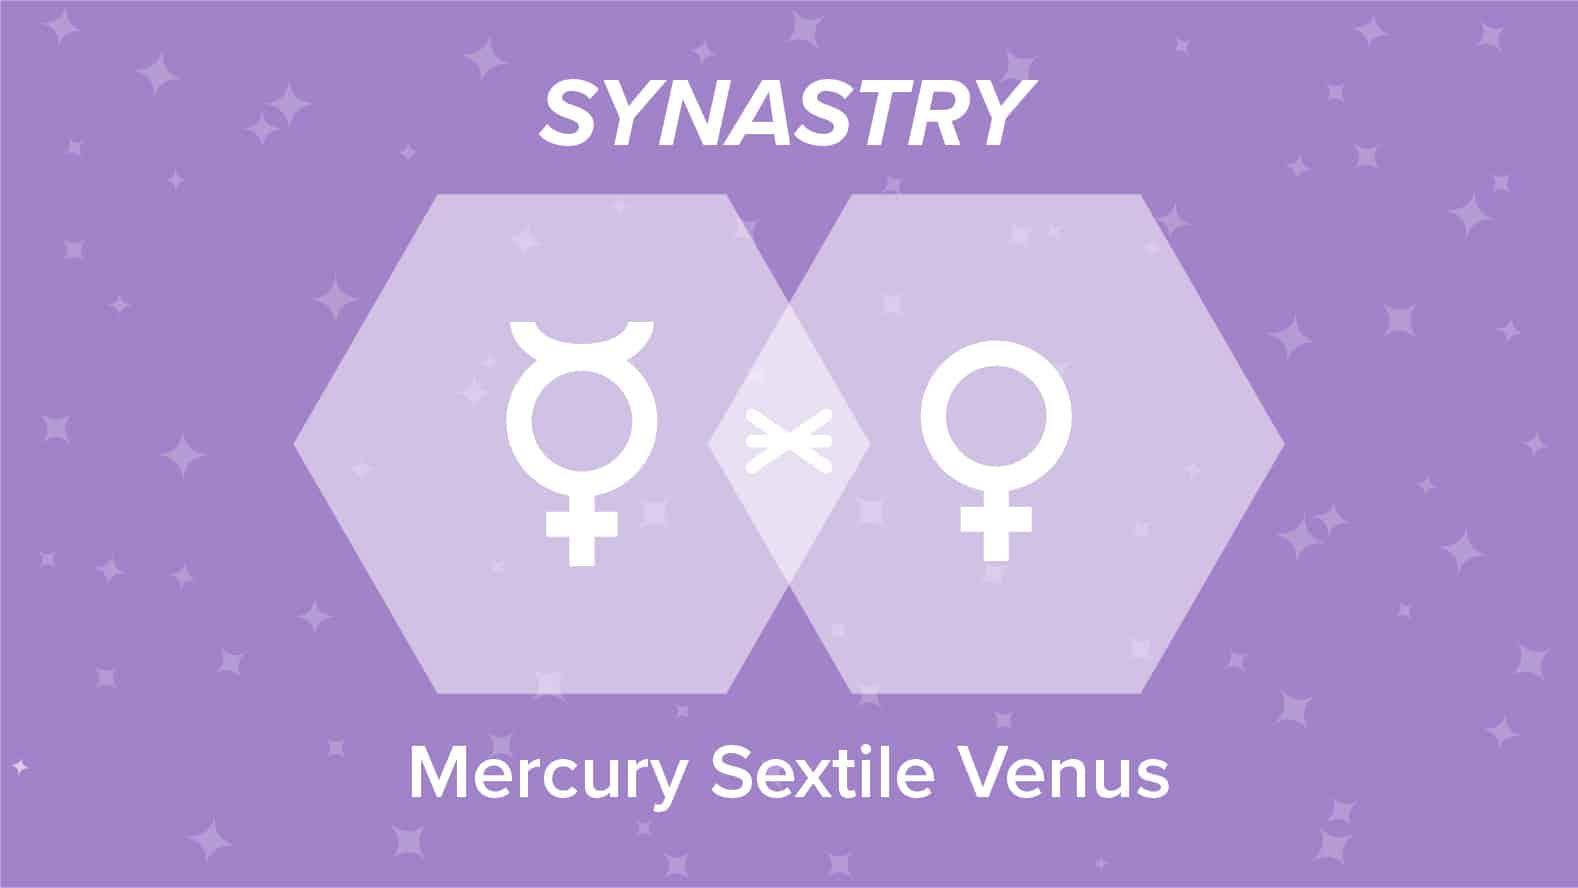 Mercury Sextile Venus Synastry